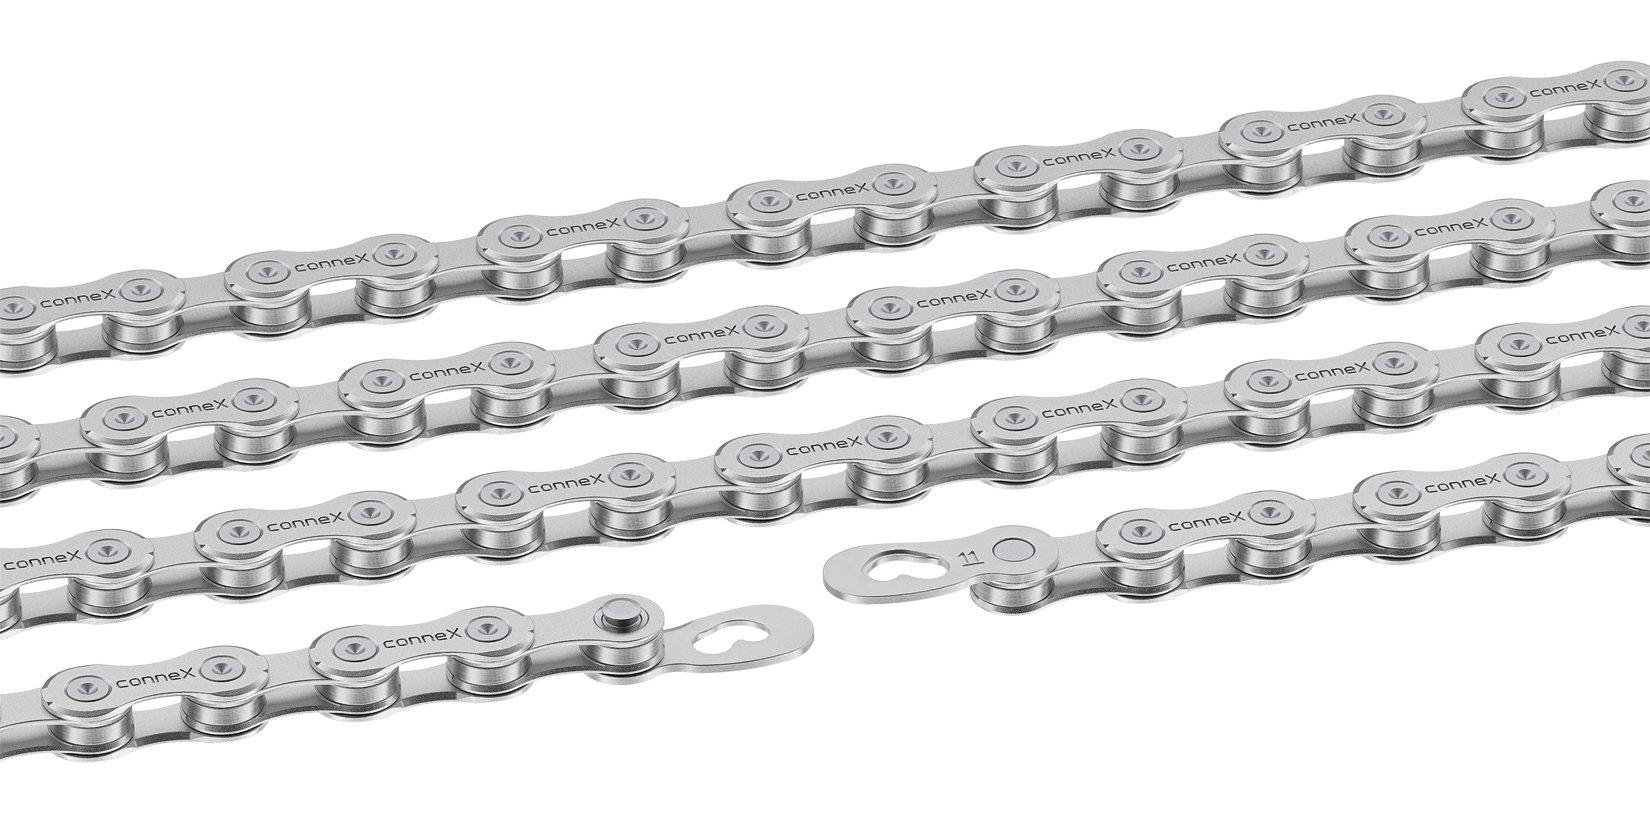 Wipperman Connex 11S0 11-Speed Steel Link